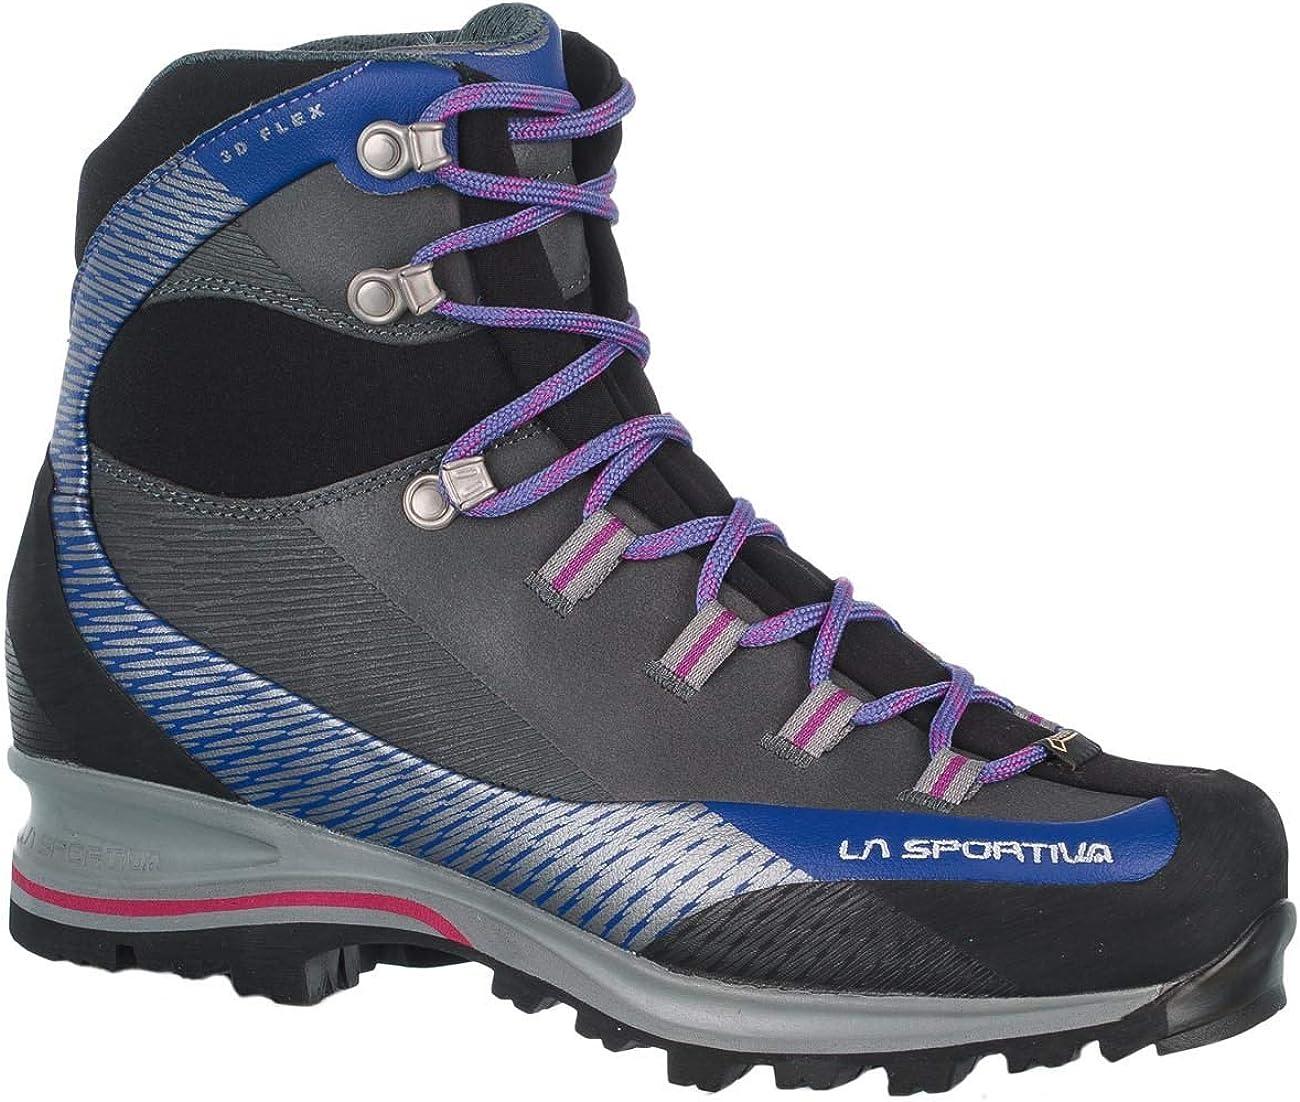 Botas de Senderismo para Mujer La Sportiva Trango TRK Leather Woman GTX Iris Blue//Purple